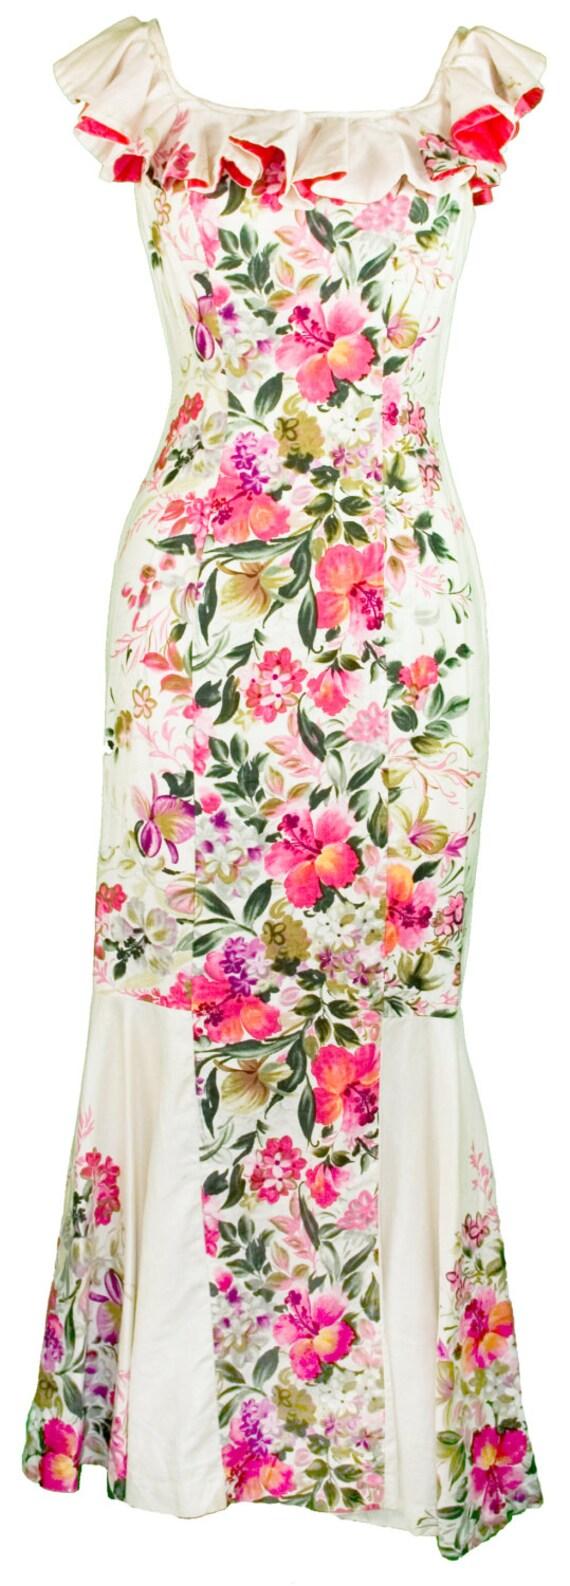 reserve hawaiian cha cha dress ruffled floral